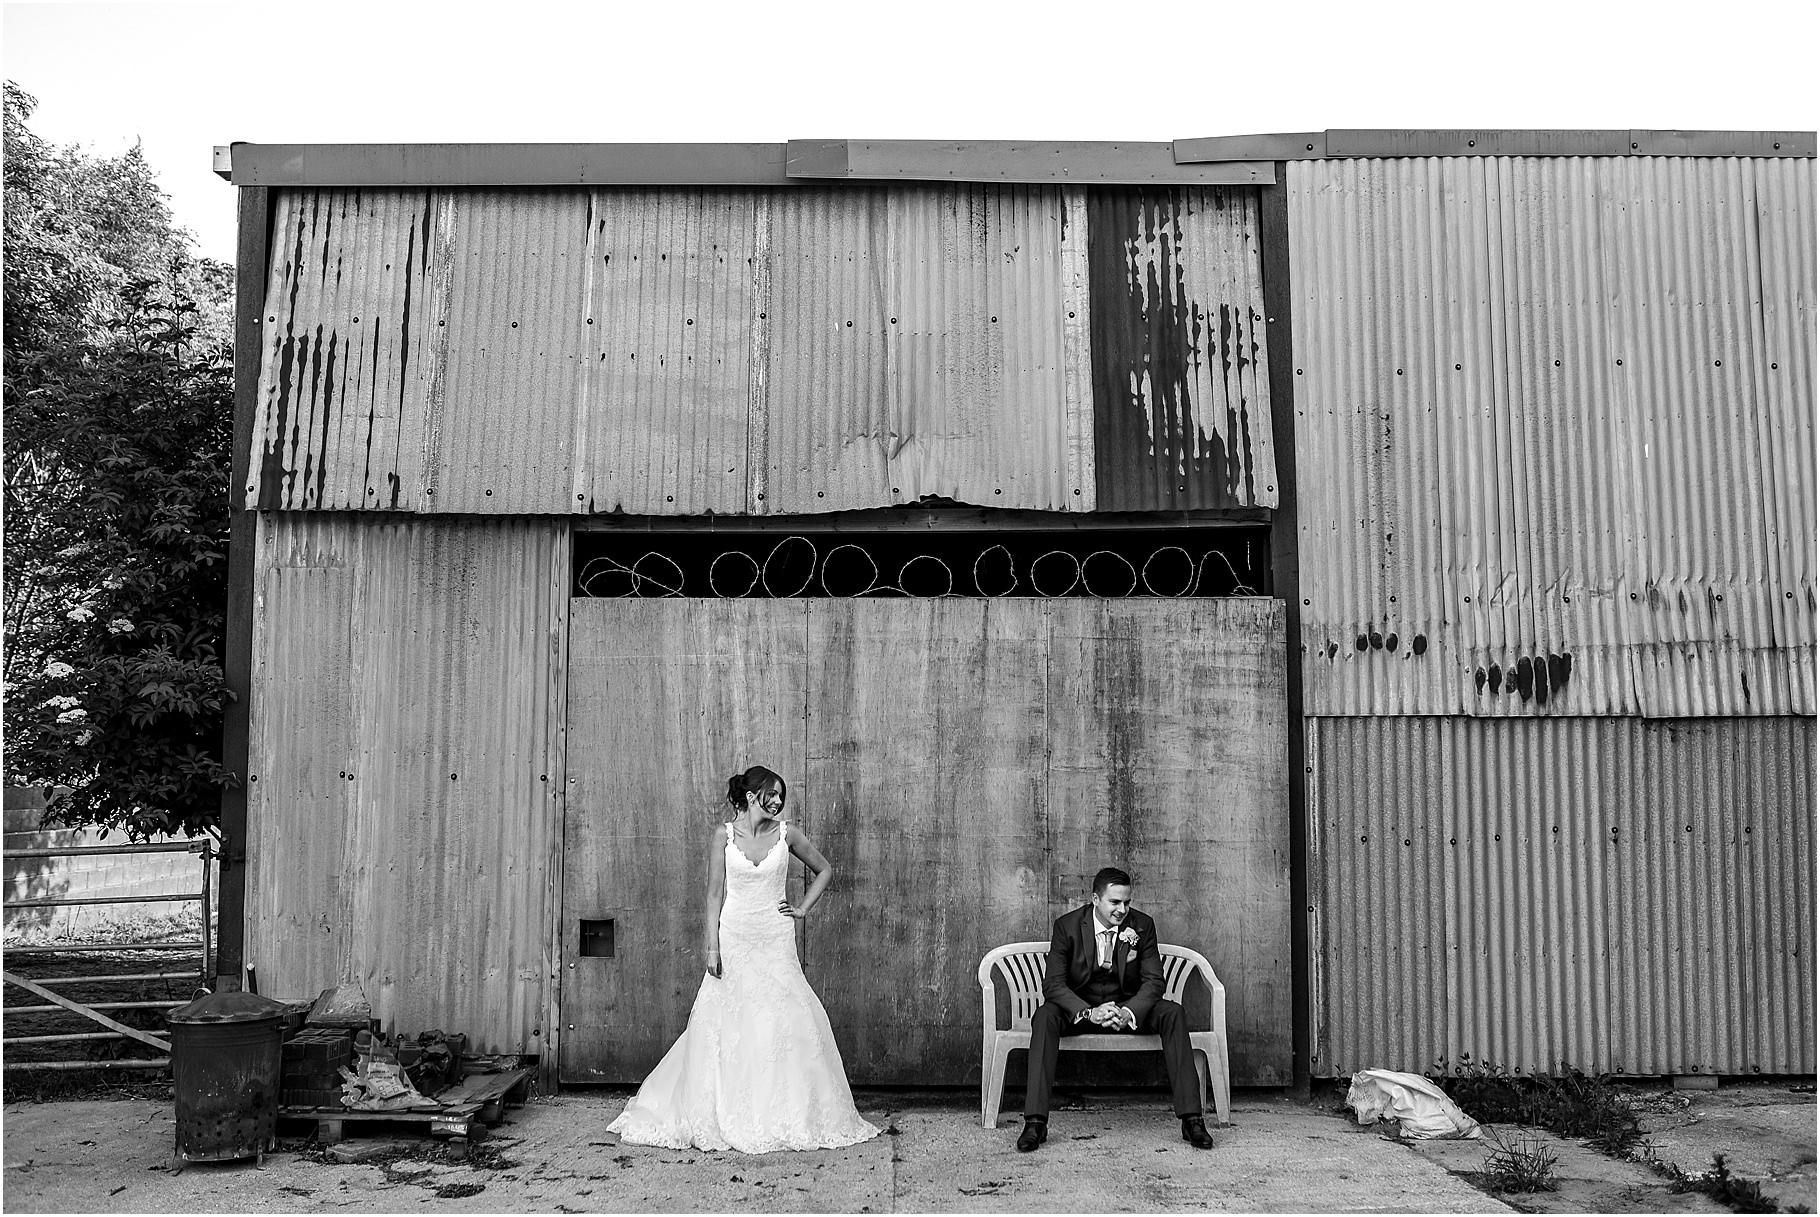 dan-wootton-photography-2017-weddings-118.jpg